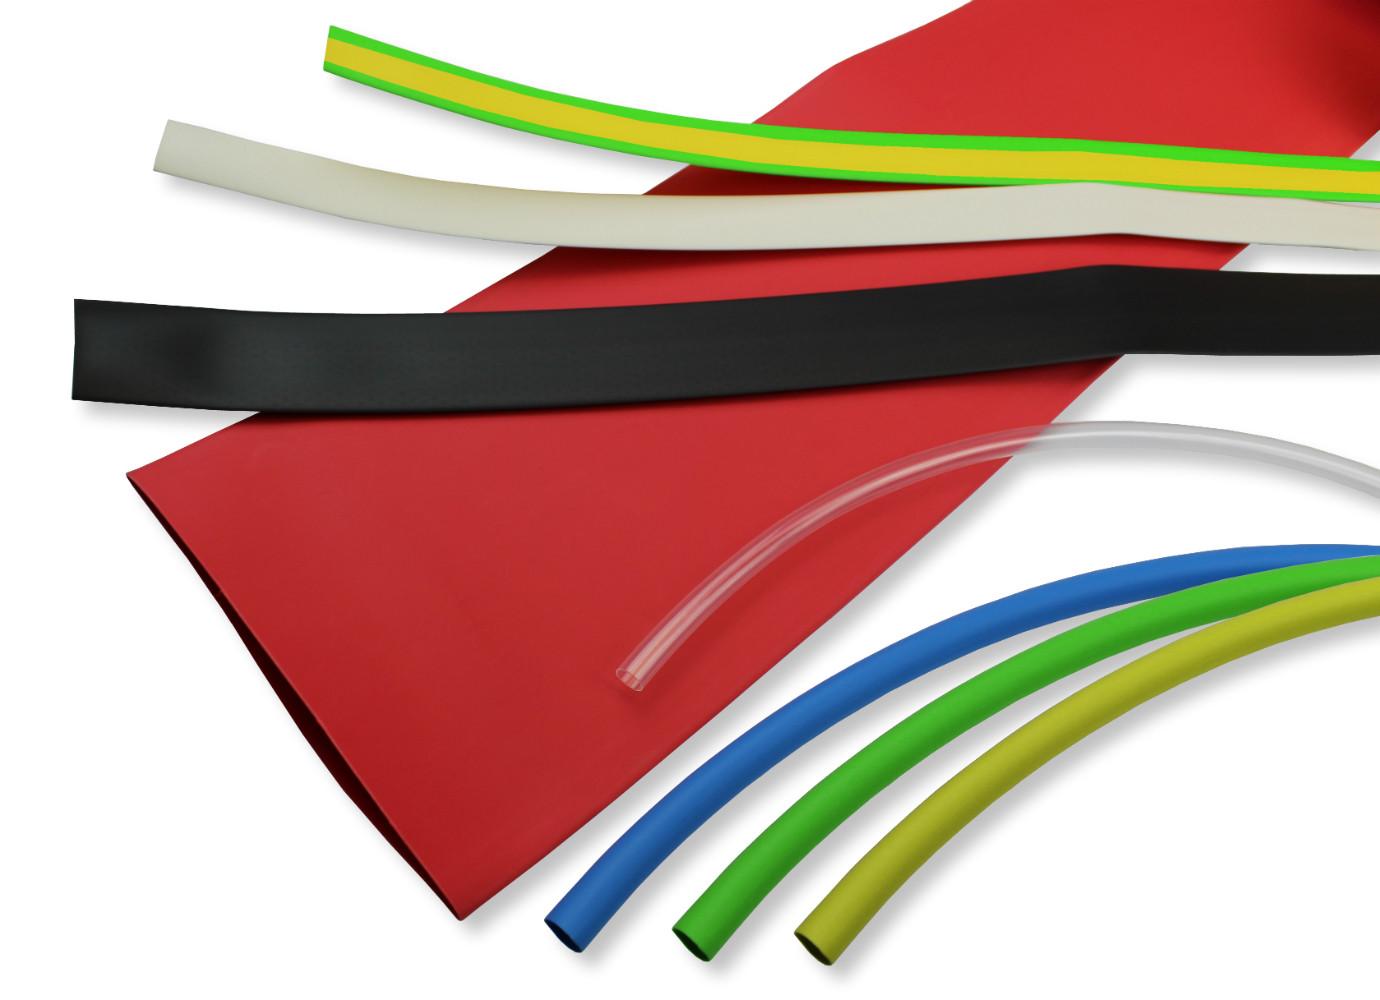 PREMIUM Heat Shrink Tubing 3:1 Ratio HSP3 size 6.0mm I.D / 2.0mm I.D Red